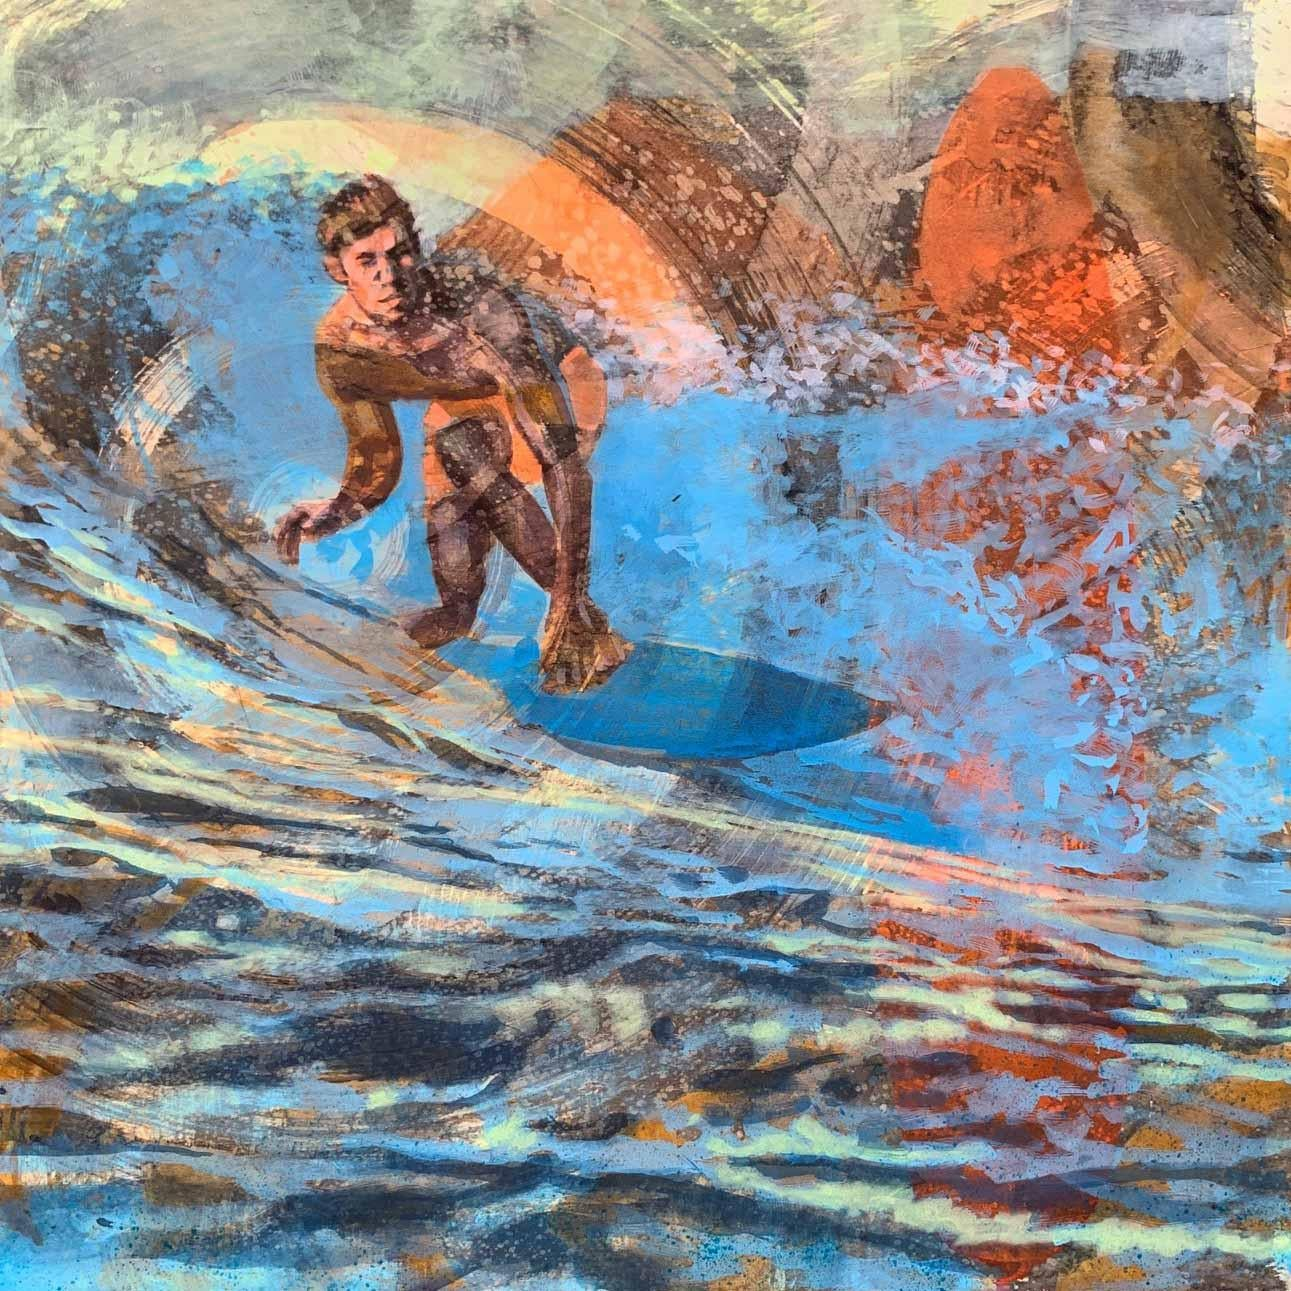 Malibu Dawn Patrol, Surfer, Water, Painting, Blue, Orange, Male Figure, Waves